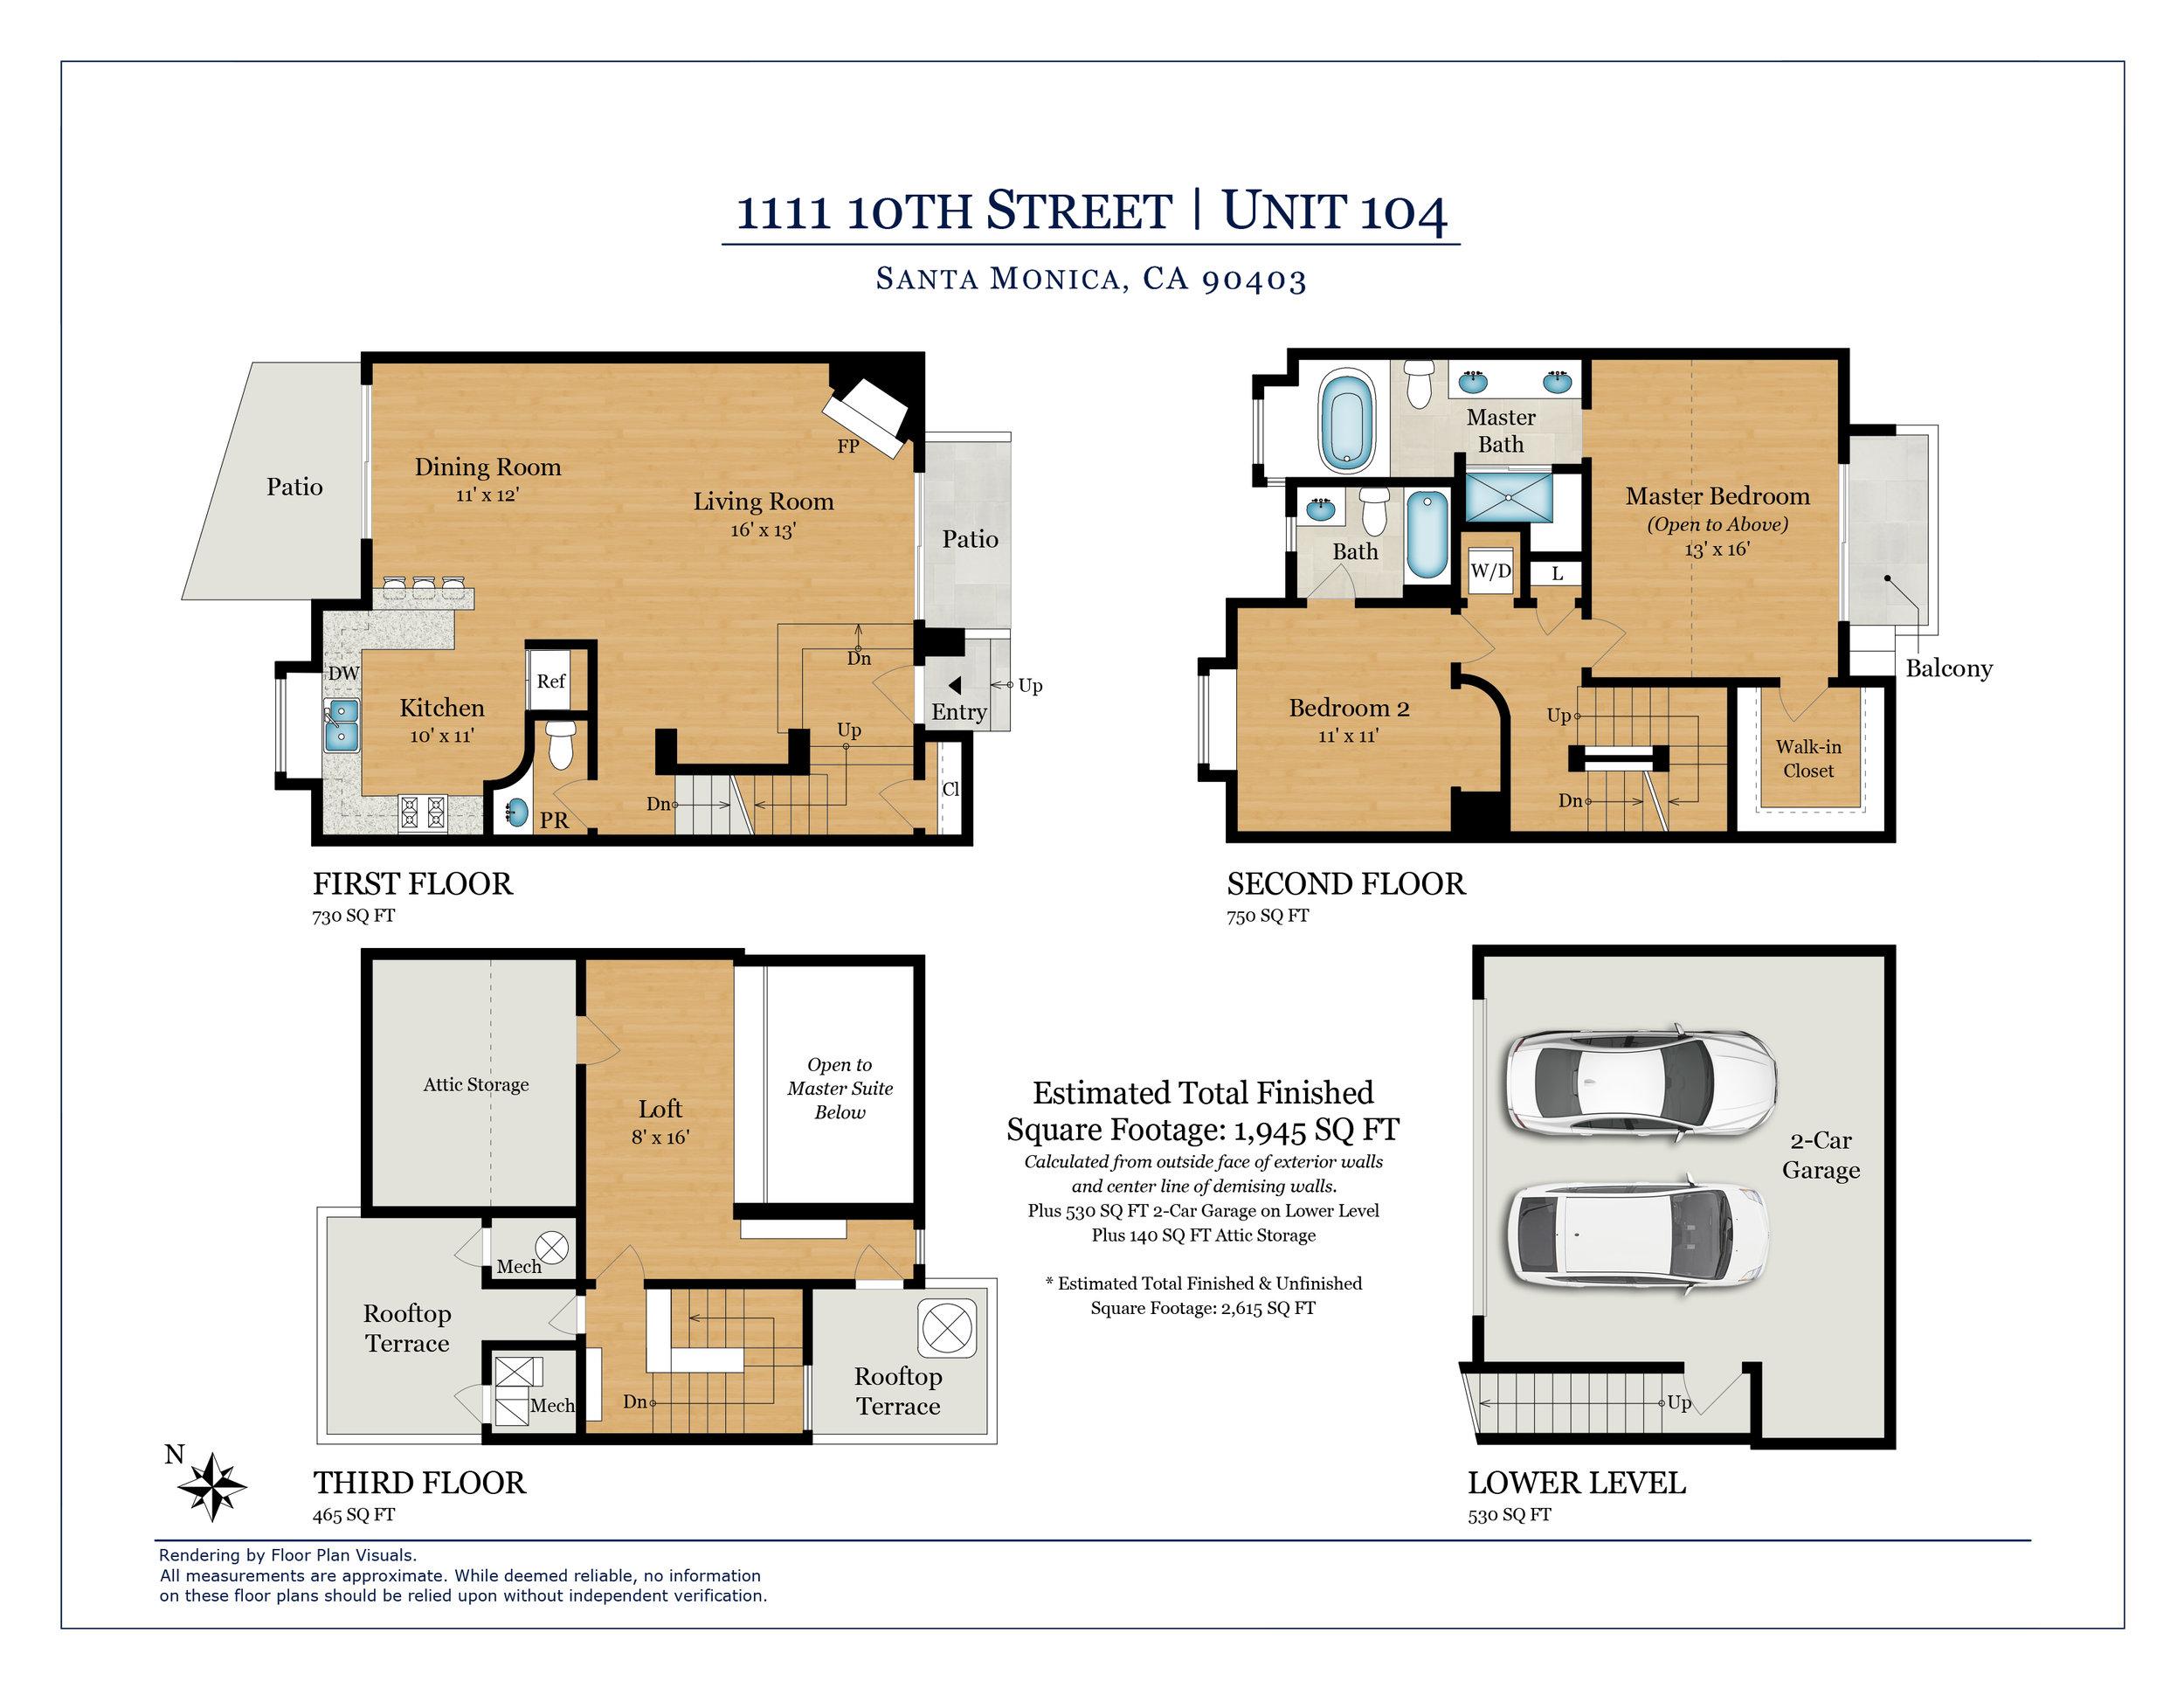 1111 10th Street #104 Floor Plan.jpg